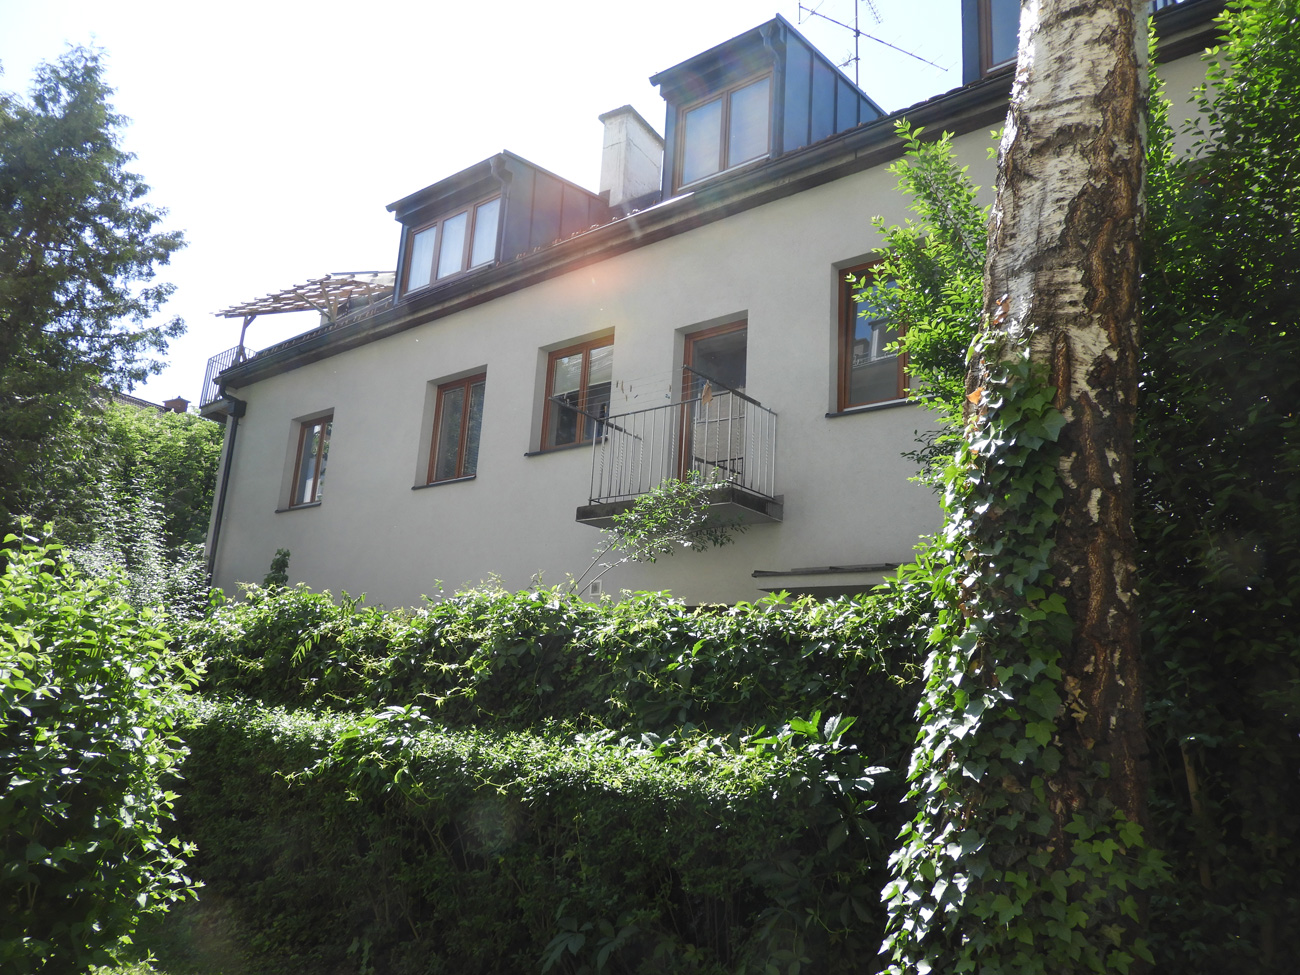 Gebirgsjäger Platz 5, Salzburg